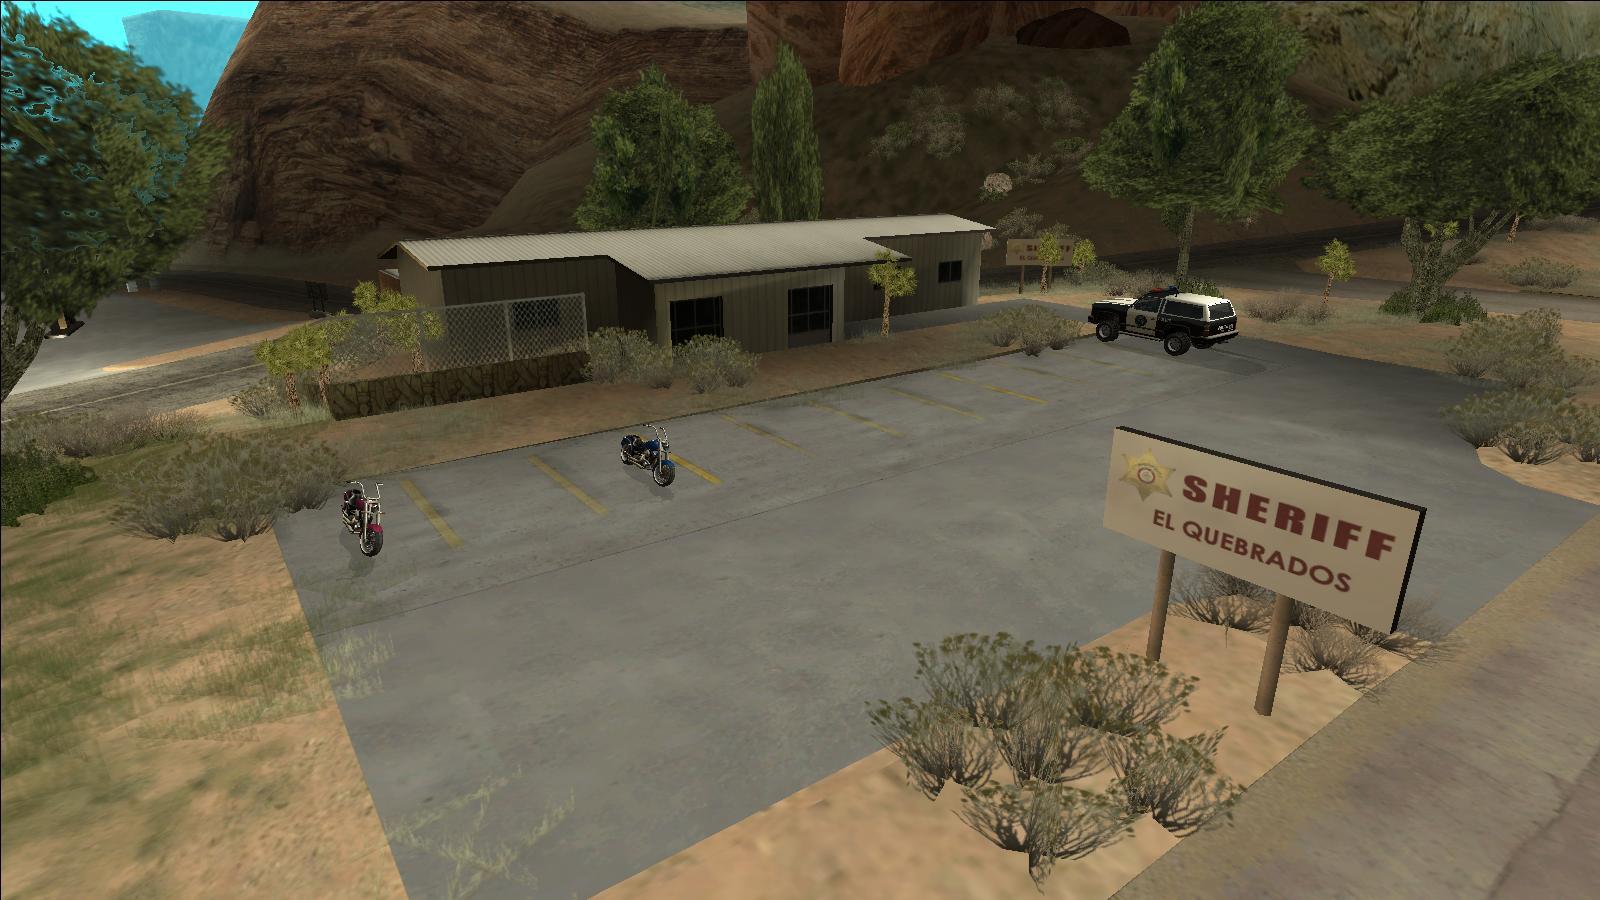 El Quebrados Sheriff's Station